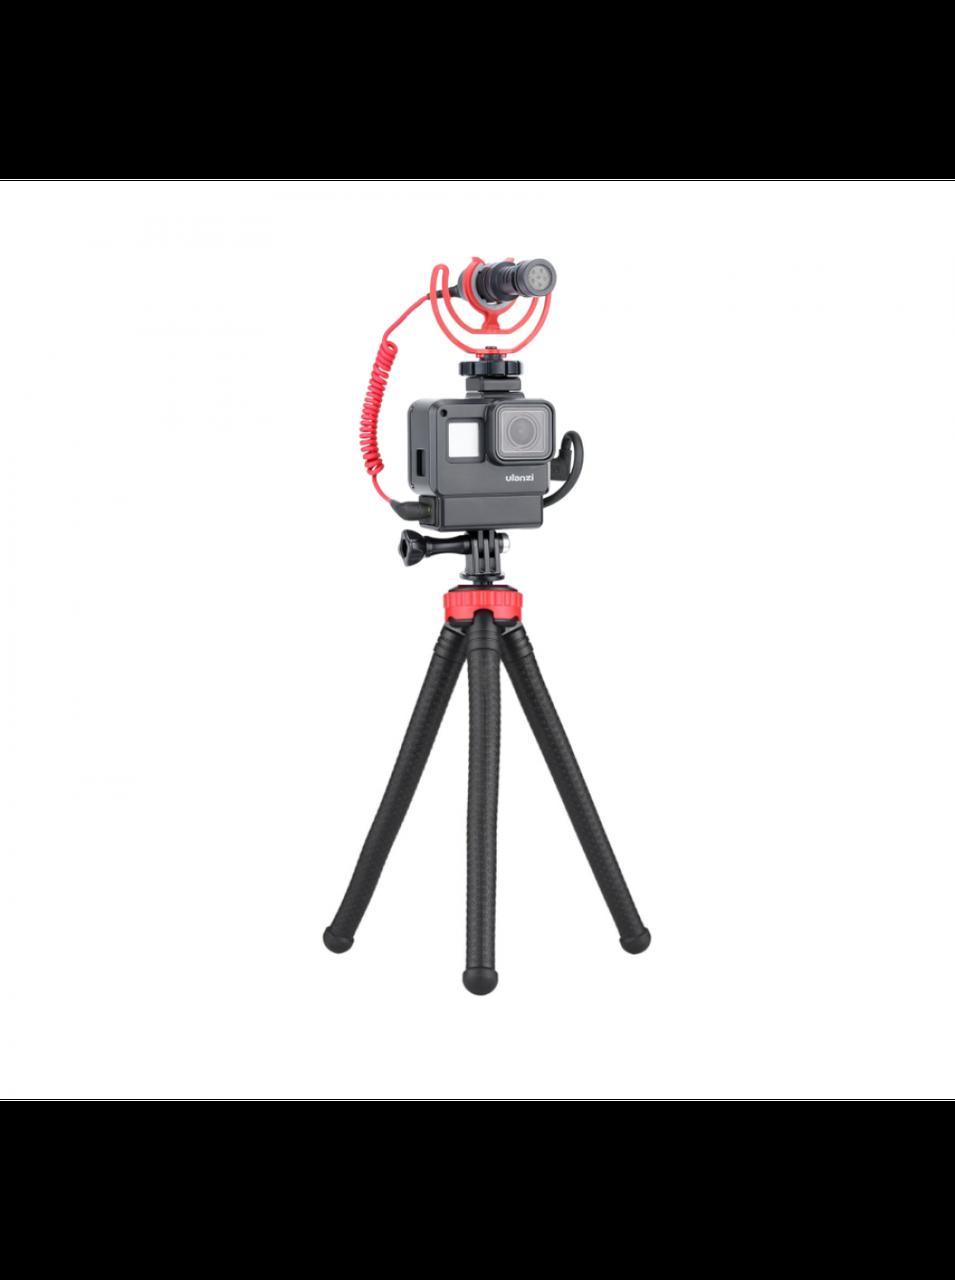 Комплект-набор блогера для экшн-камеры GoPro Hero7 Black